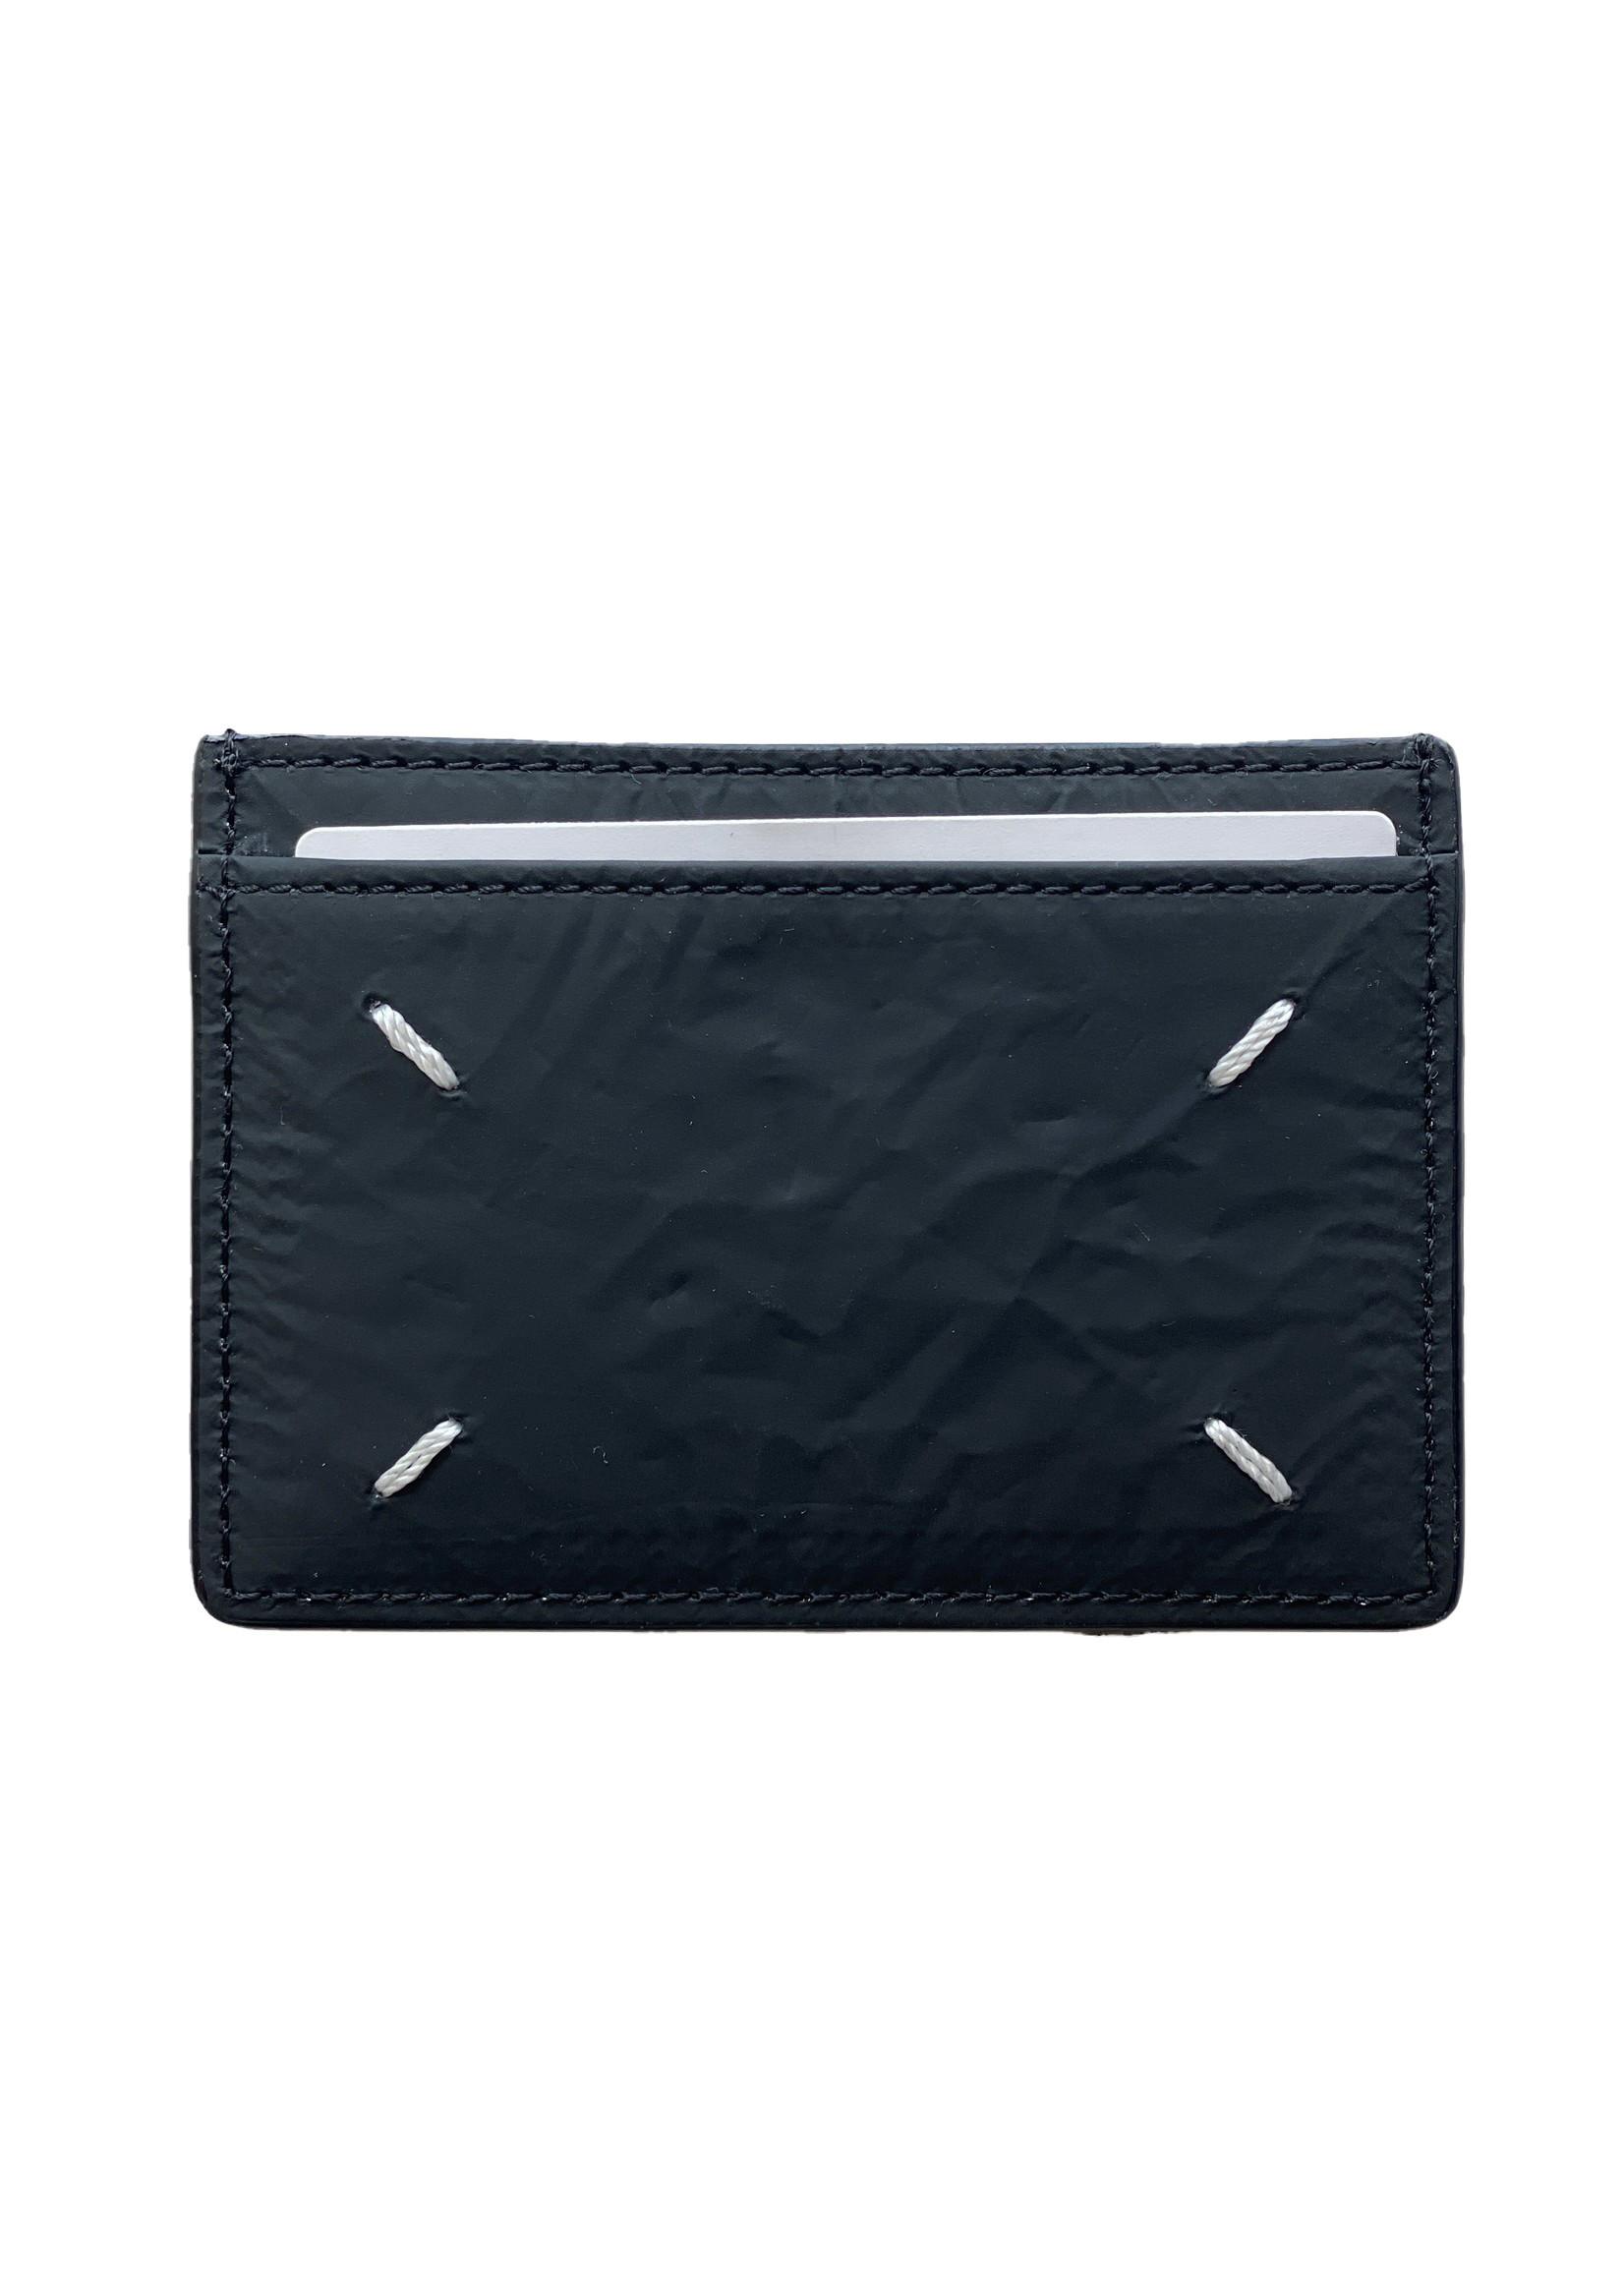 Maison Margiela Wrinkled Leather Cardholder in Black